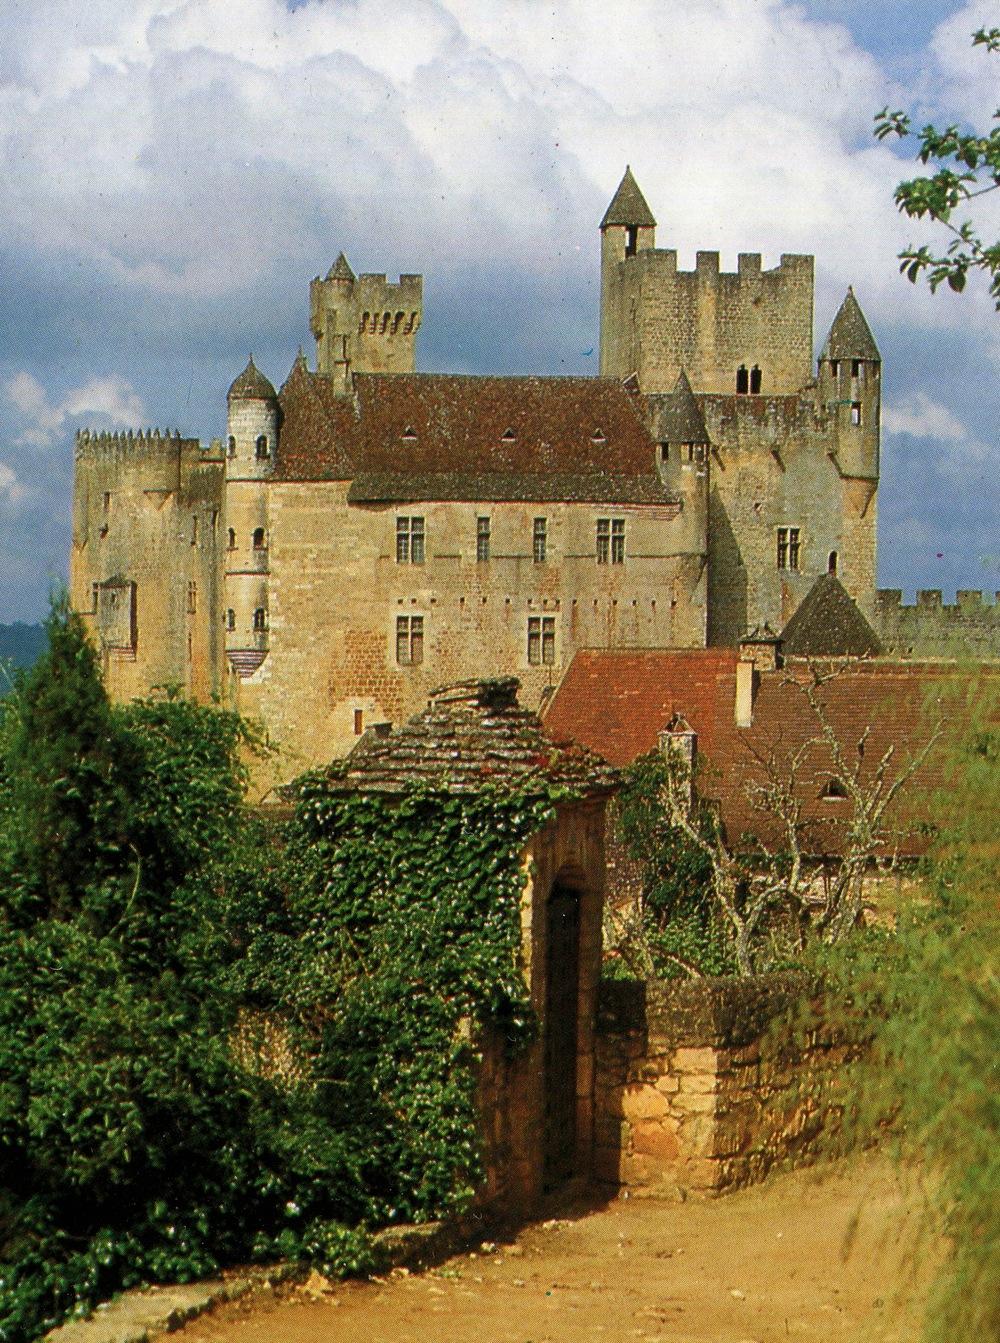 Beynac Castle, France